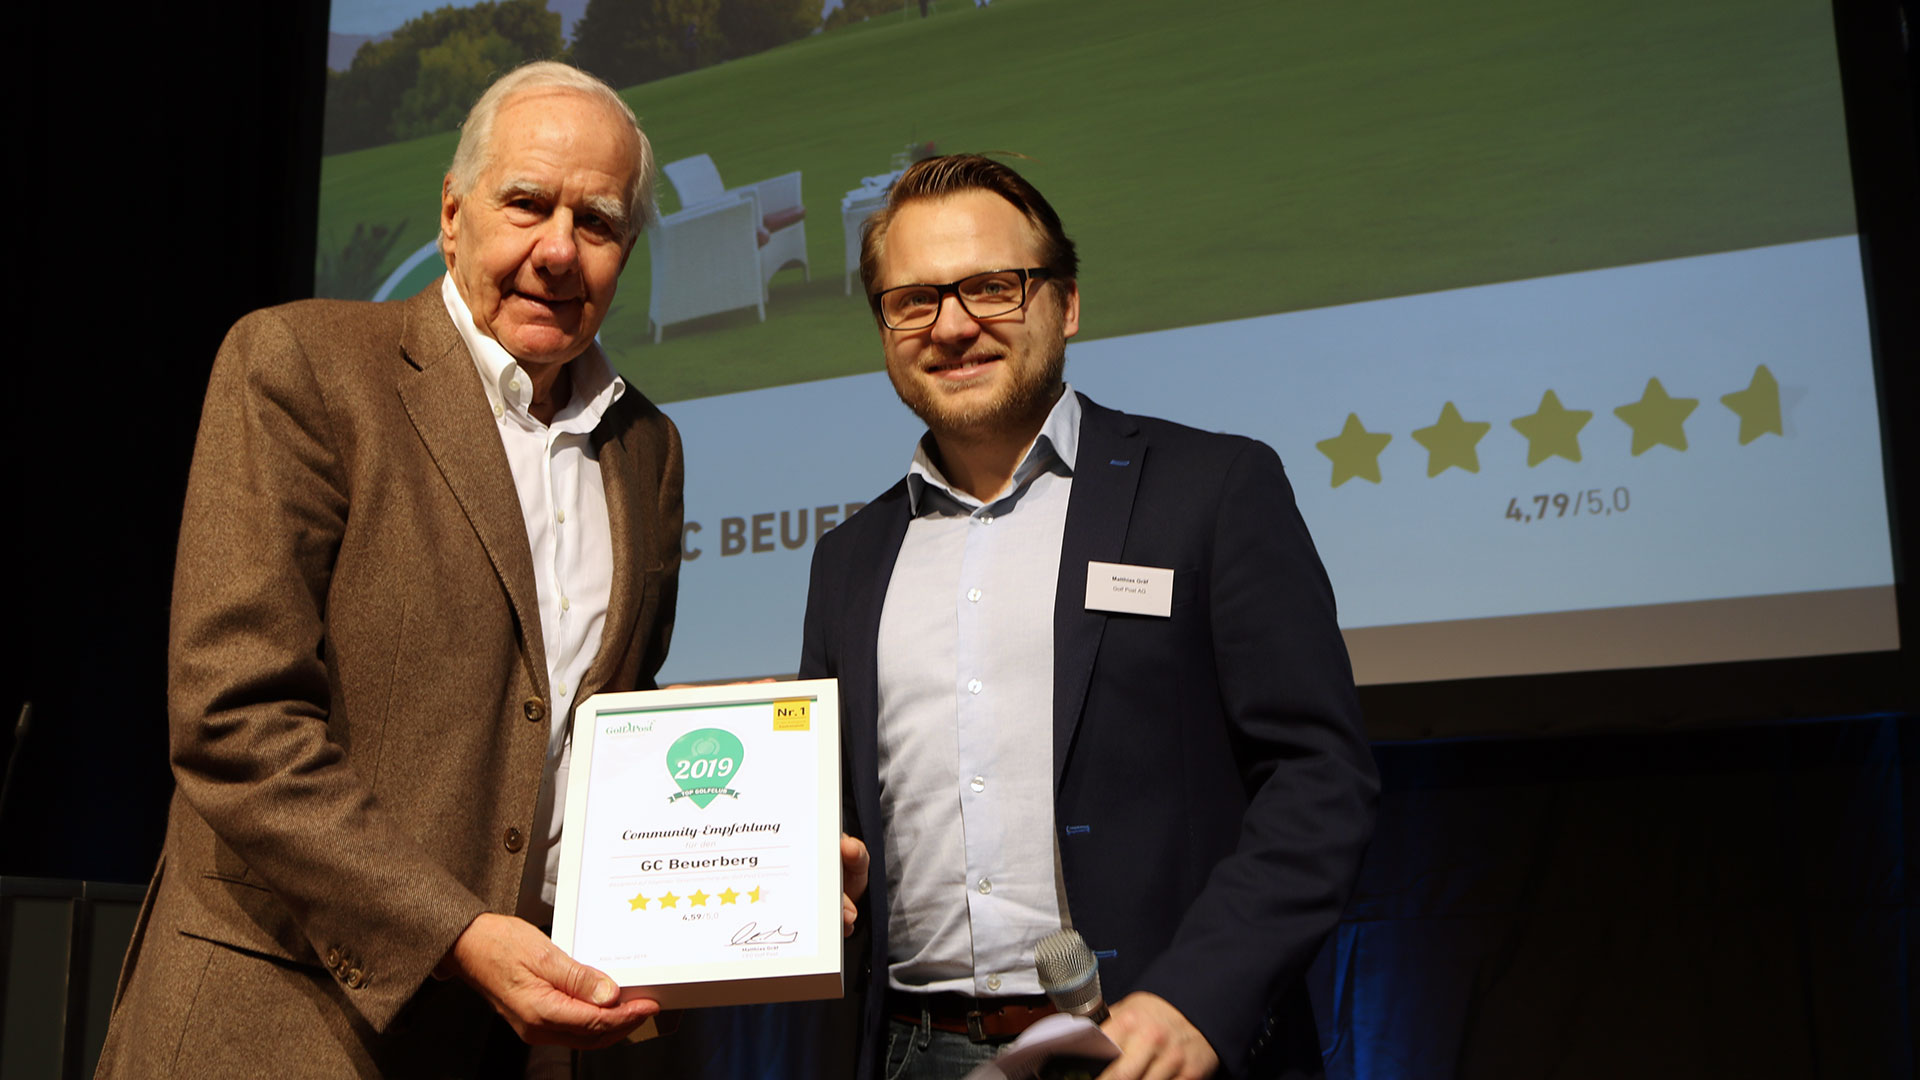 Der Präsident des GC Beuerberg nimmt den Golf Post Community Award entgegen. (Foto: Golf Post)